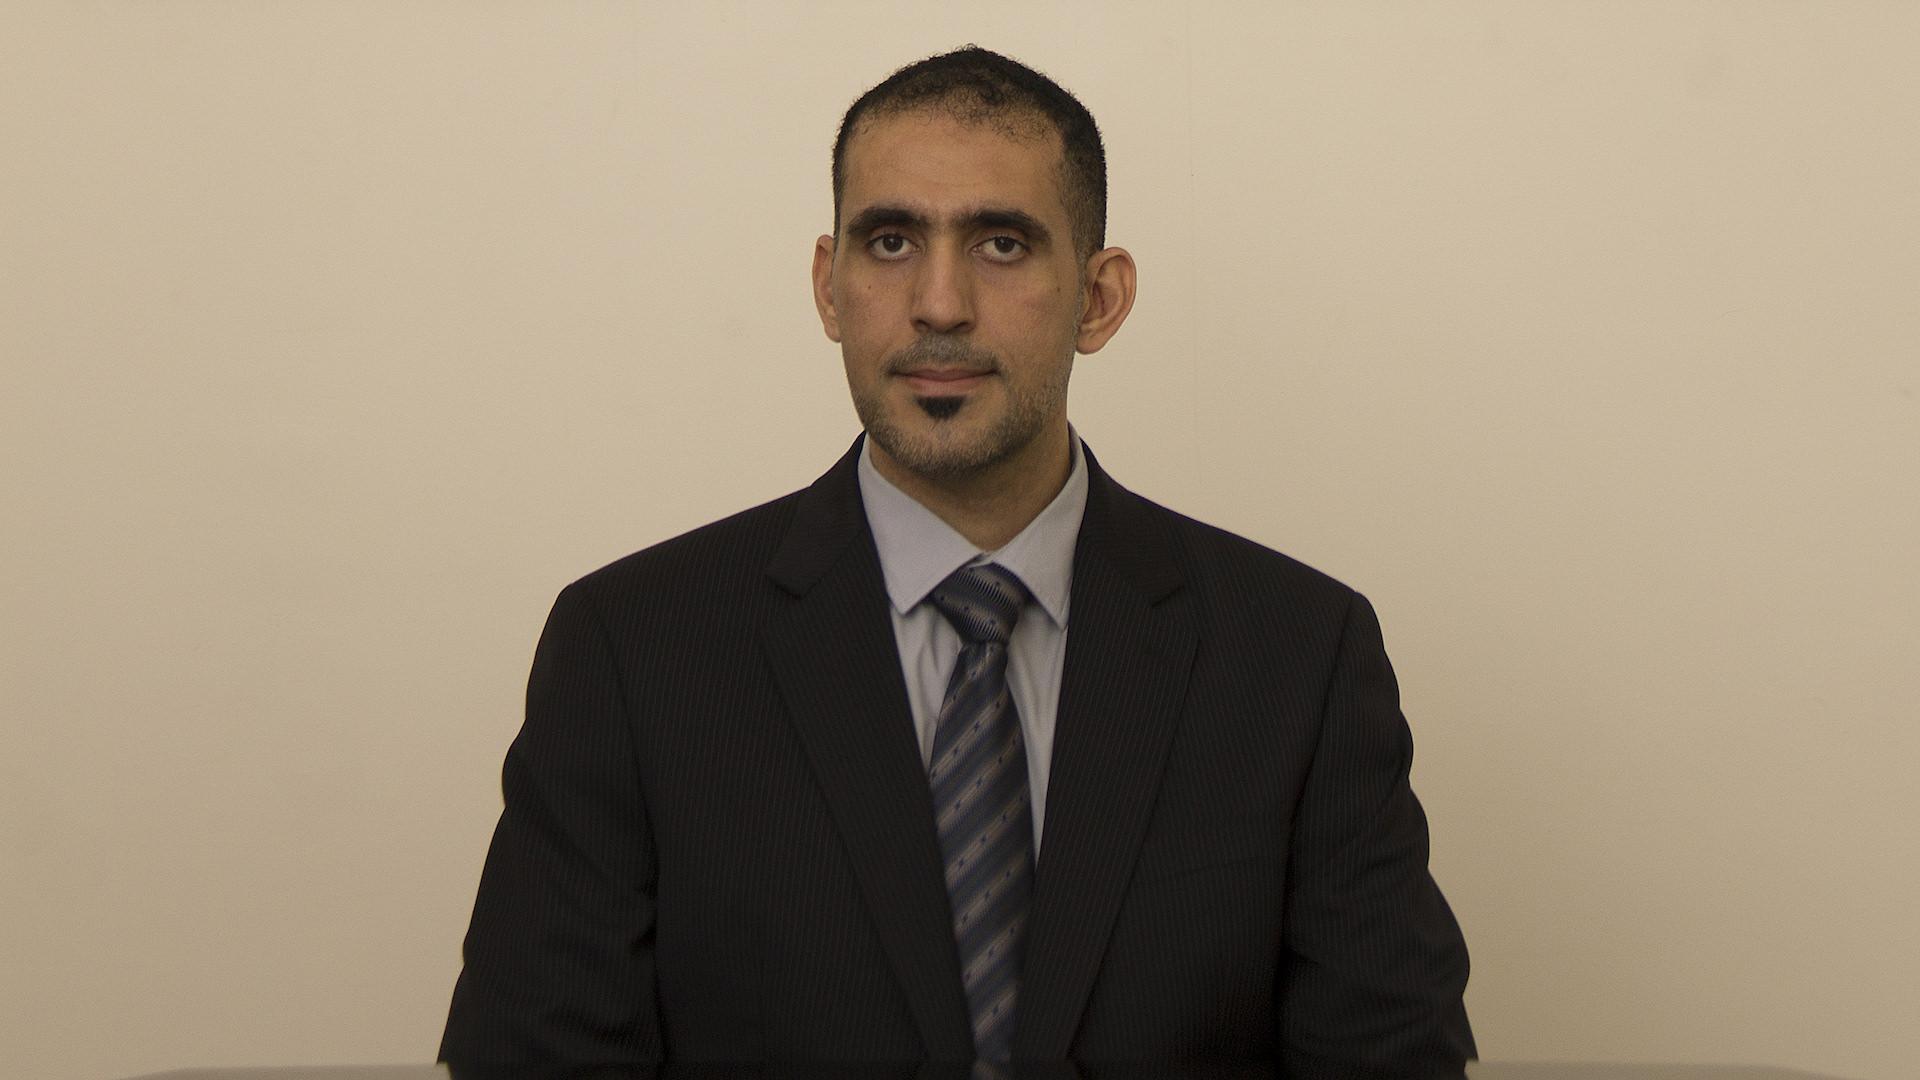 Dr. Yousif Sharaf